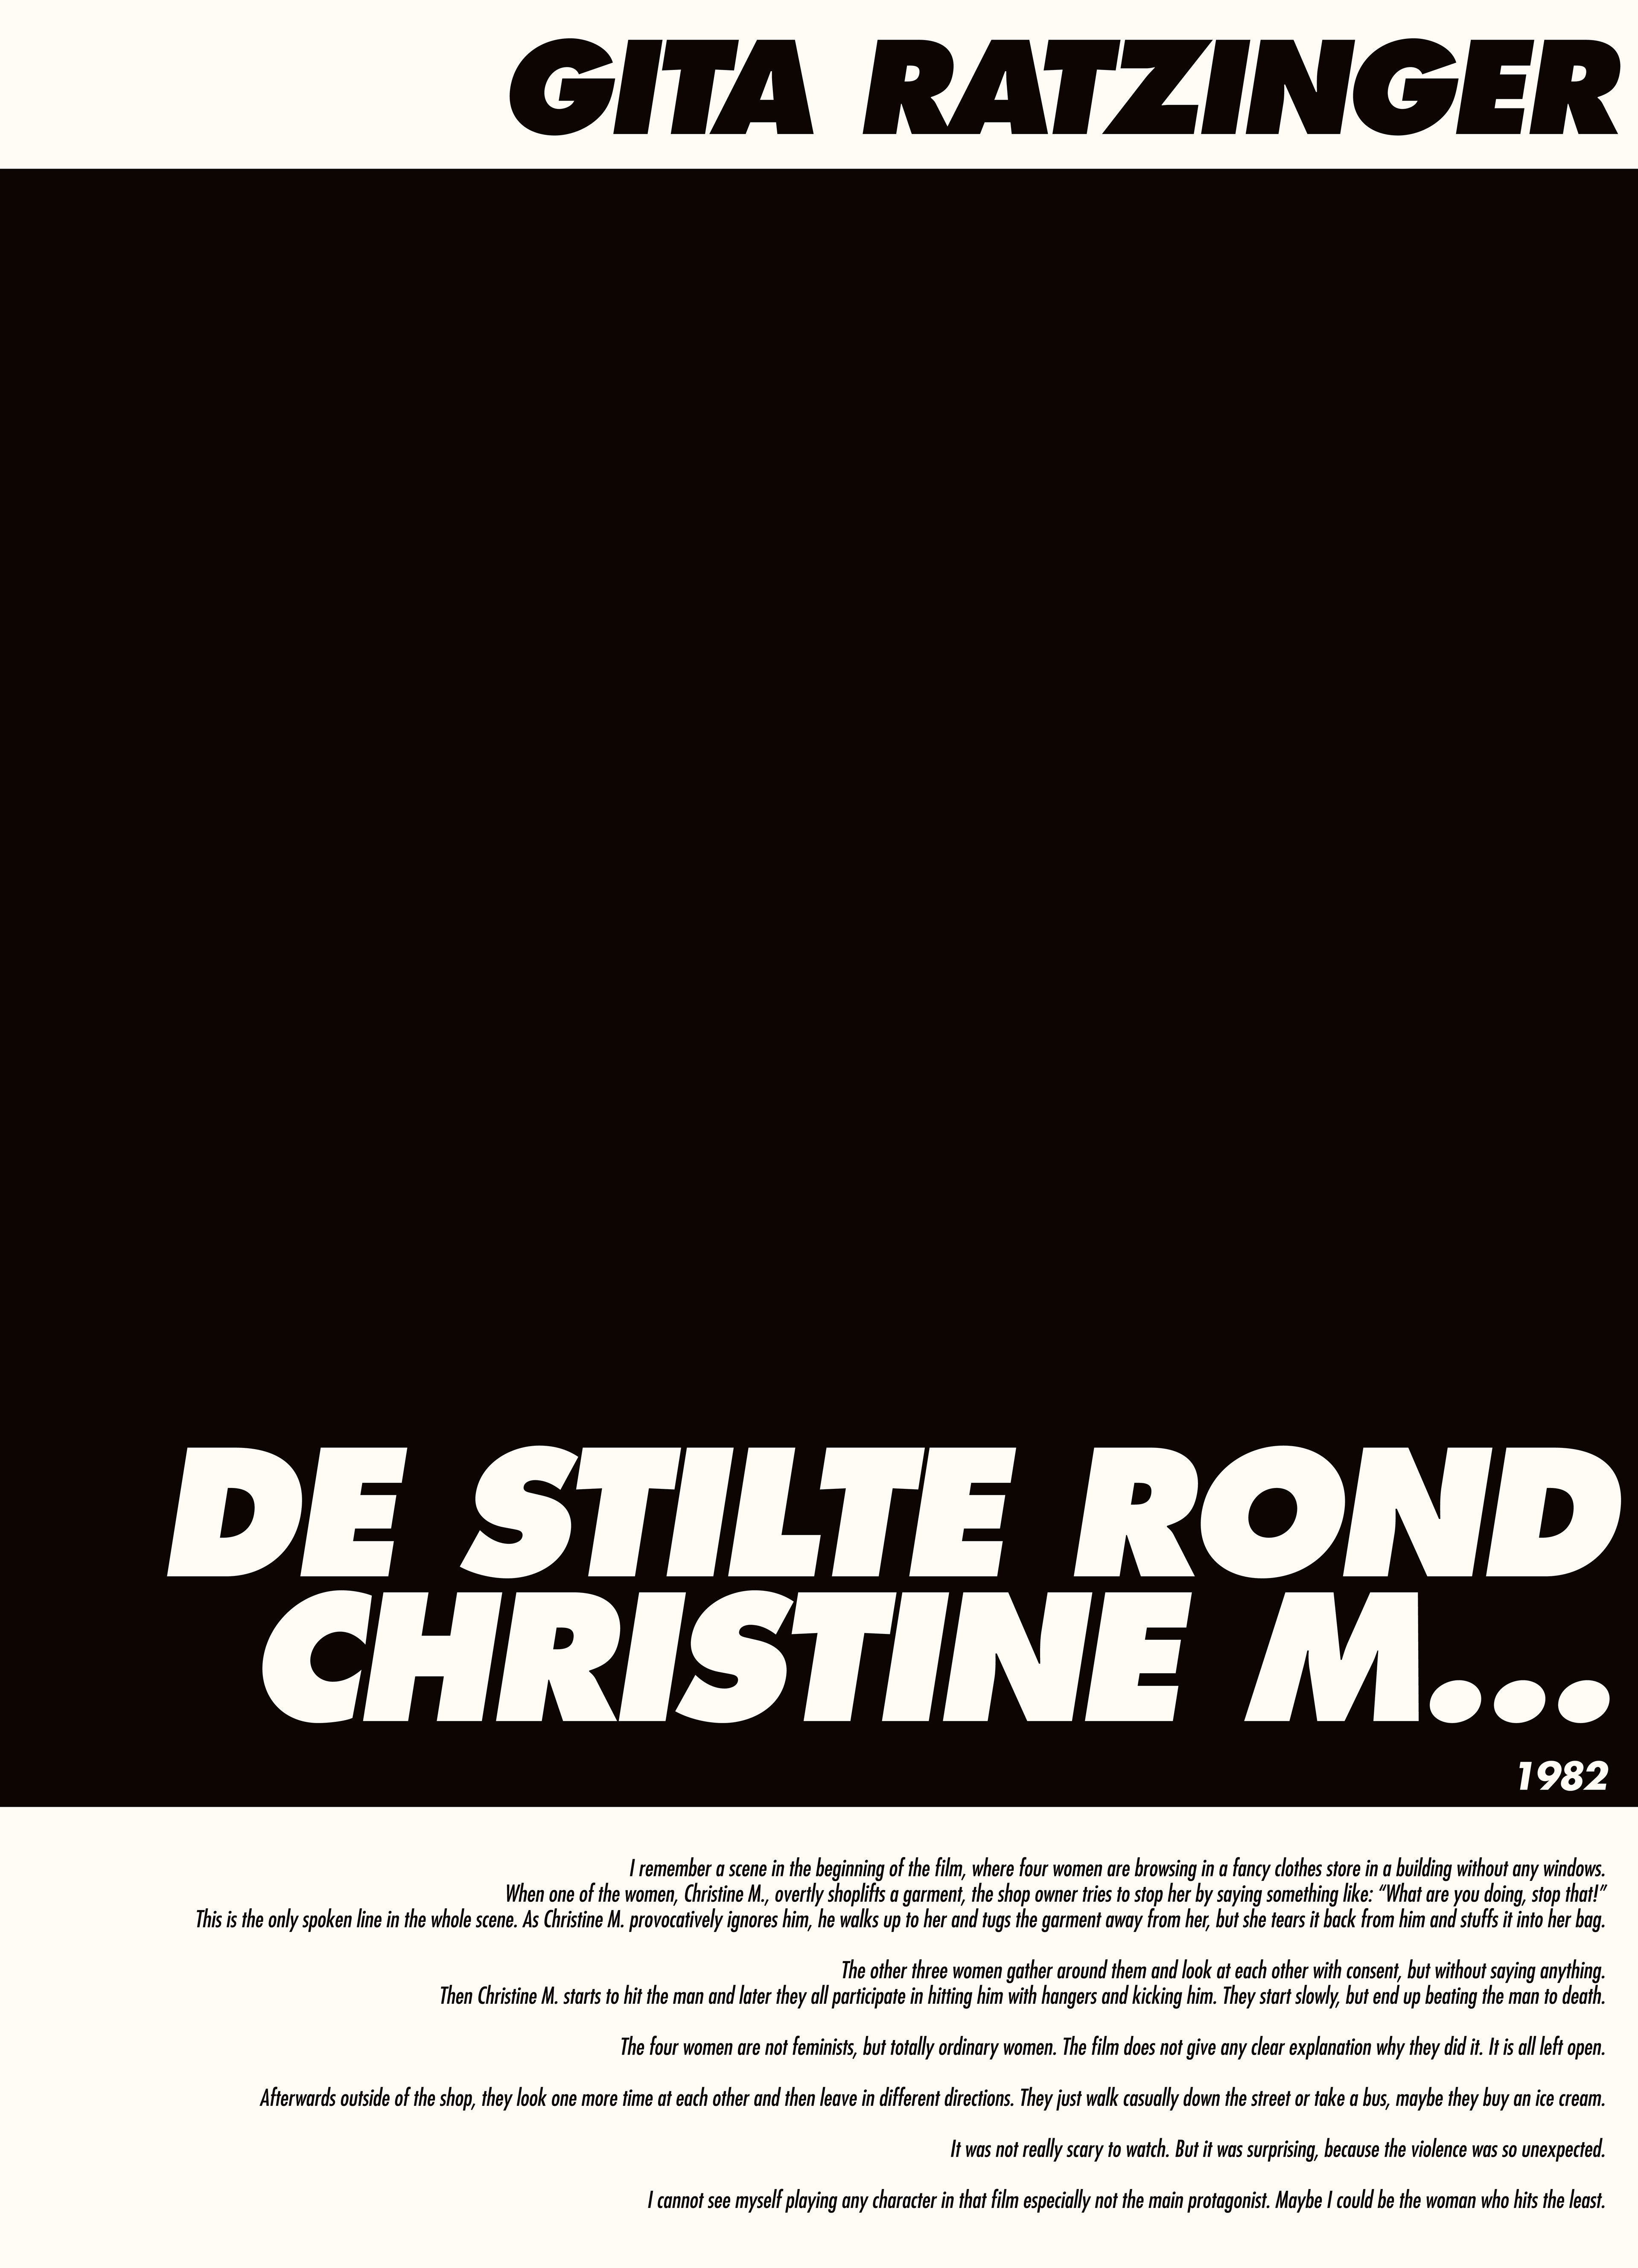 De Stilte Rond- Christine M.